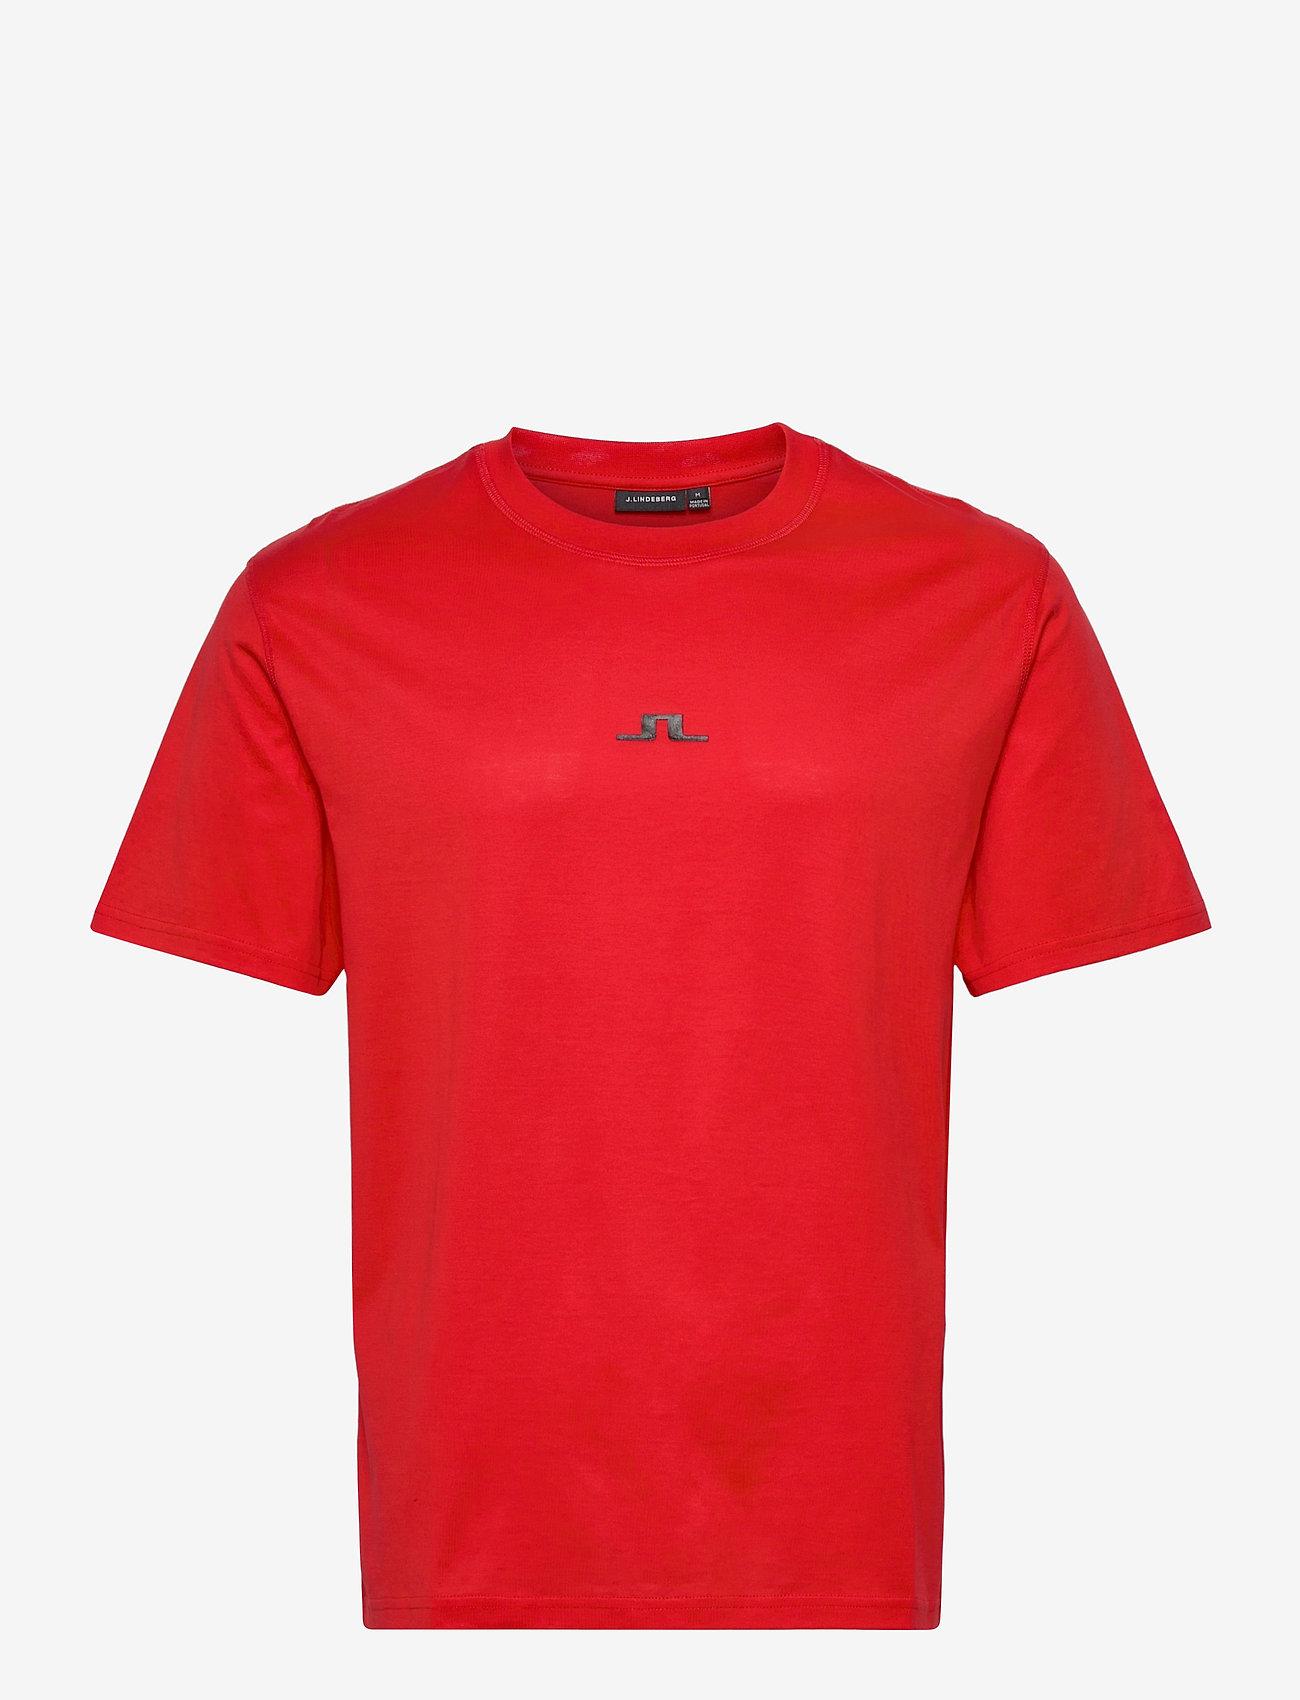 J. Lindeberg - Jordan Bridge t-shirt cotton - basic t-shirts - racing red - 0